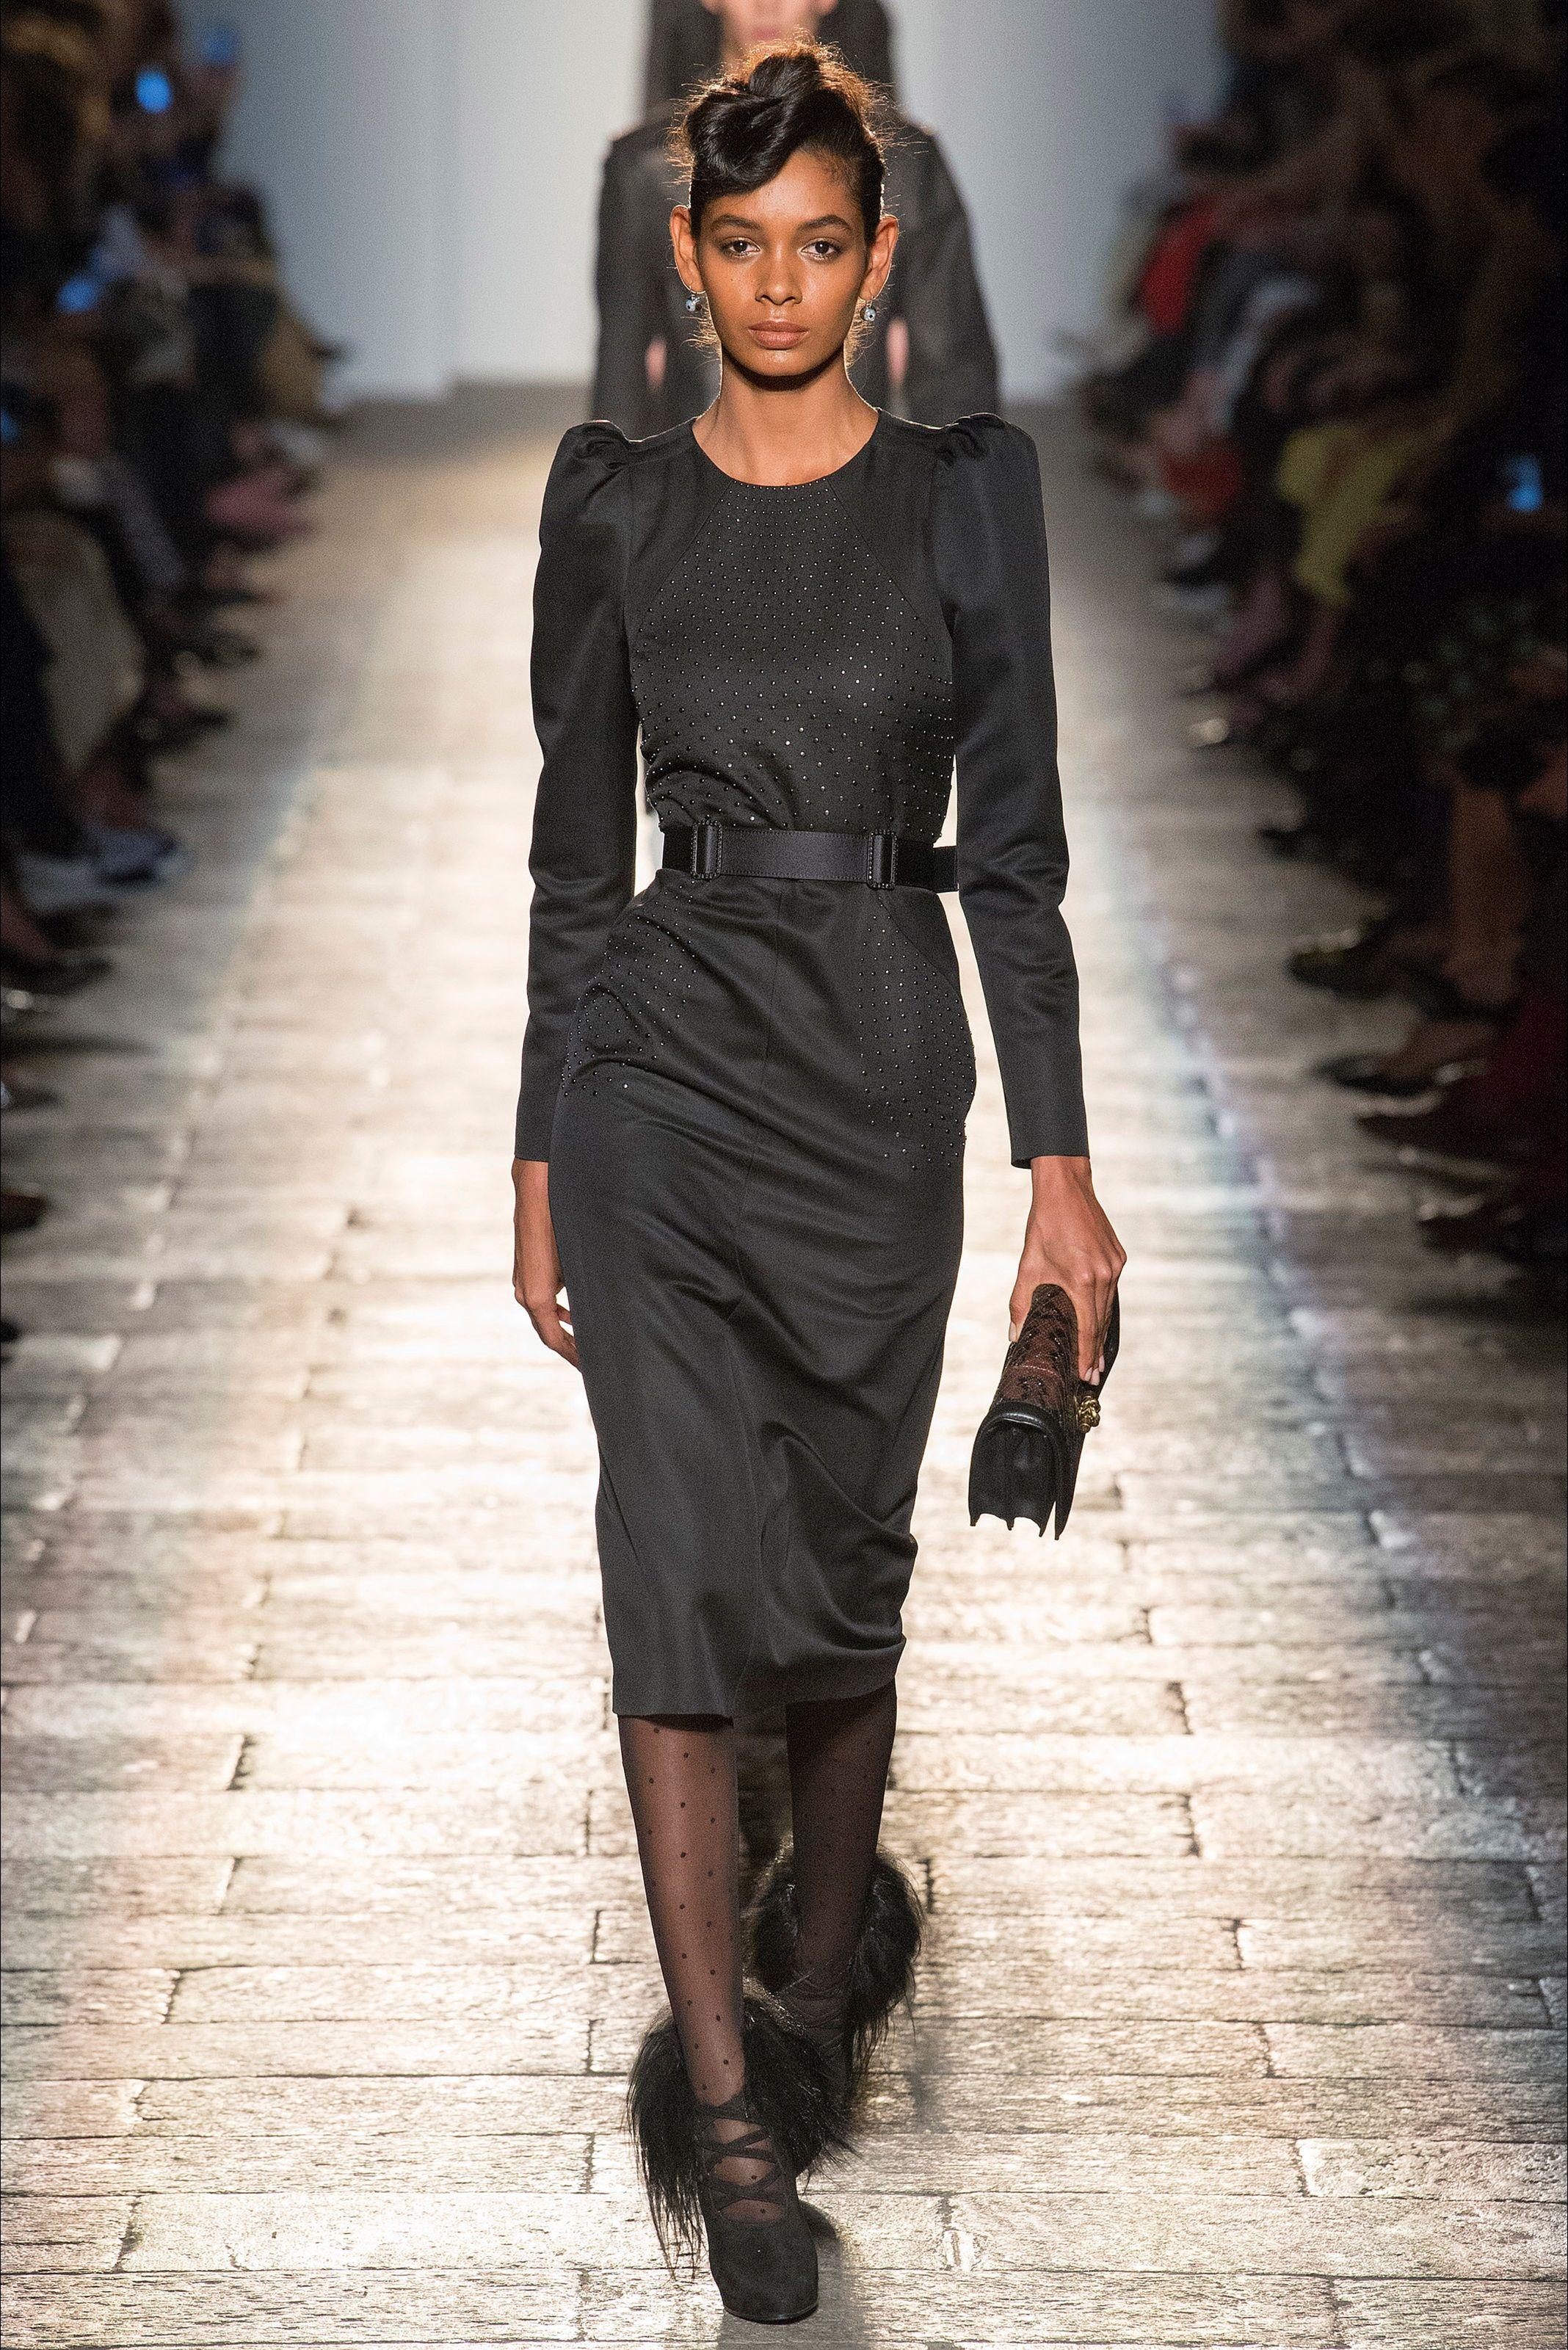 half off 36896 973a9 Bottega Veneta - Black dress FW Collection 2017-18   Dressy ...